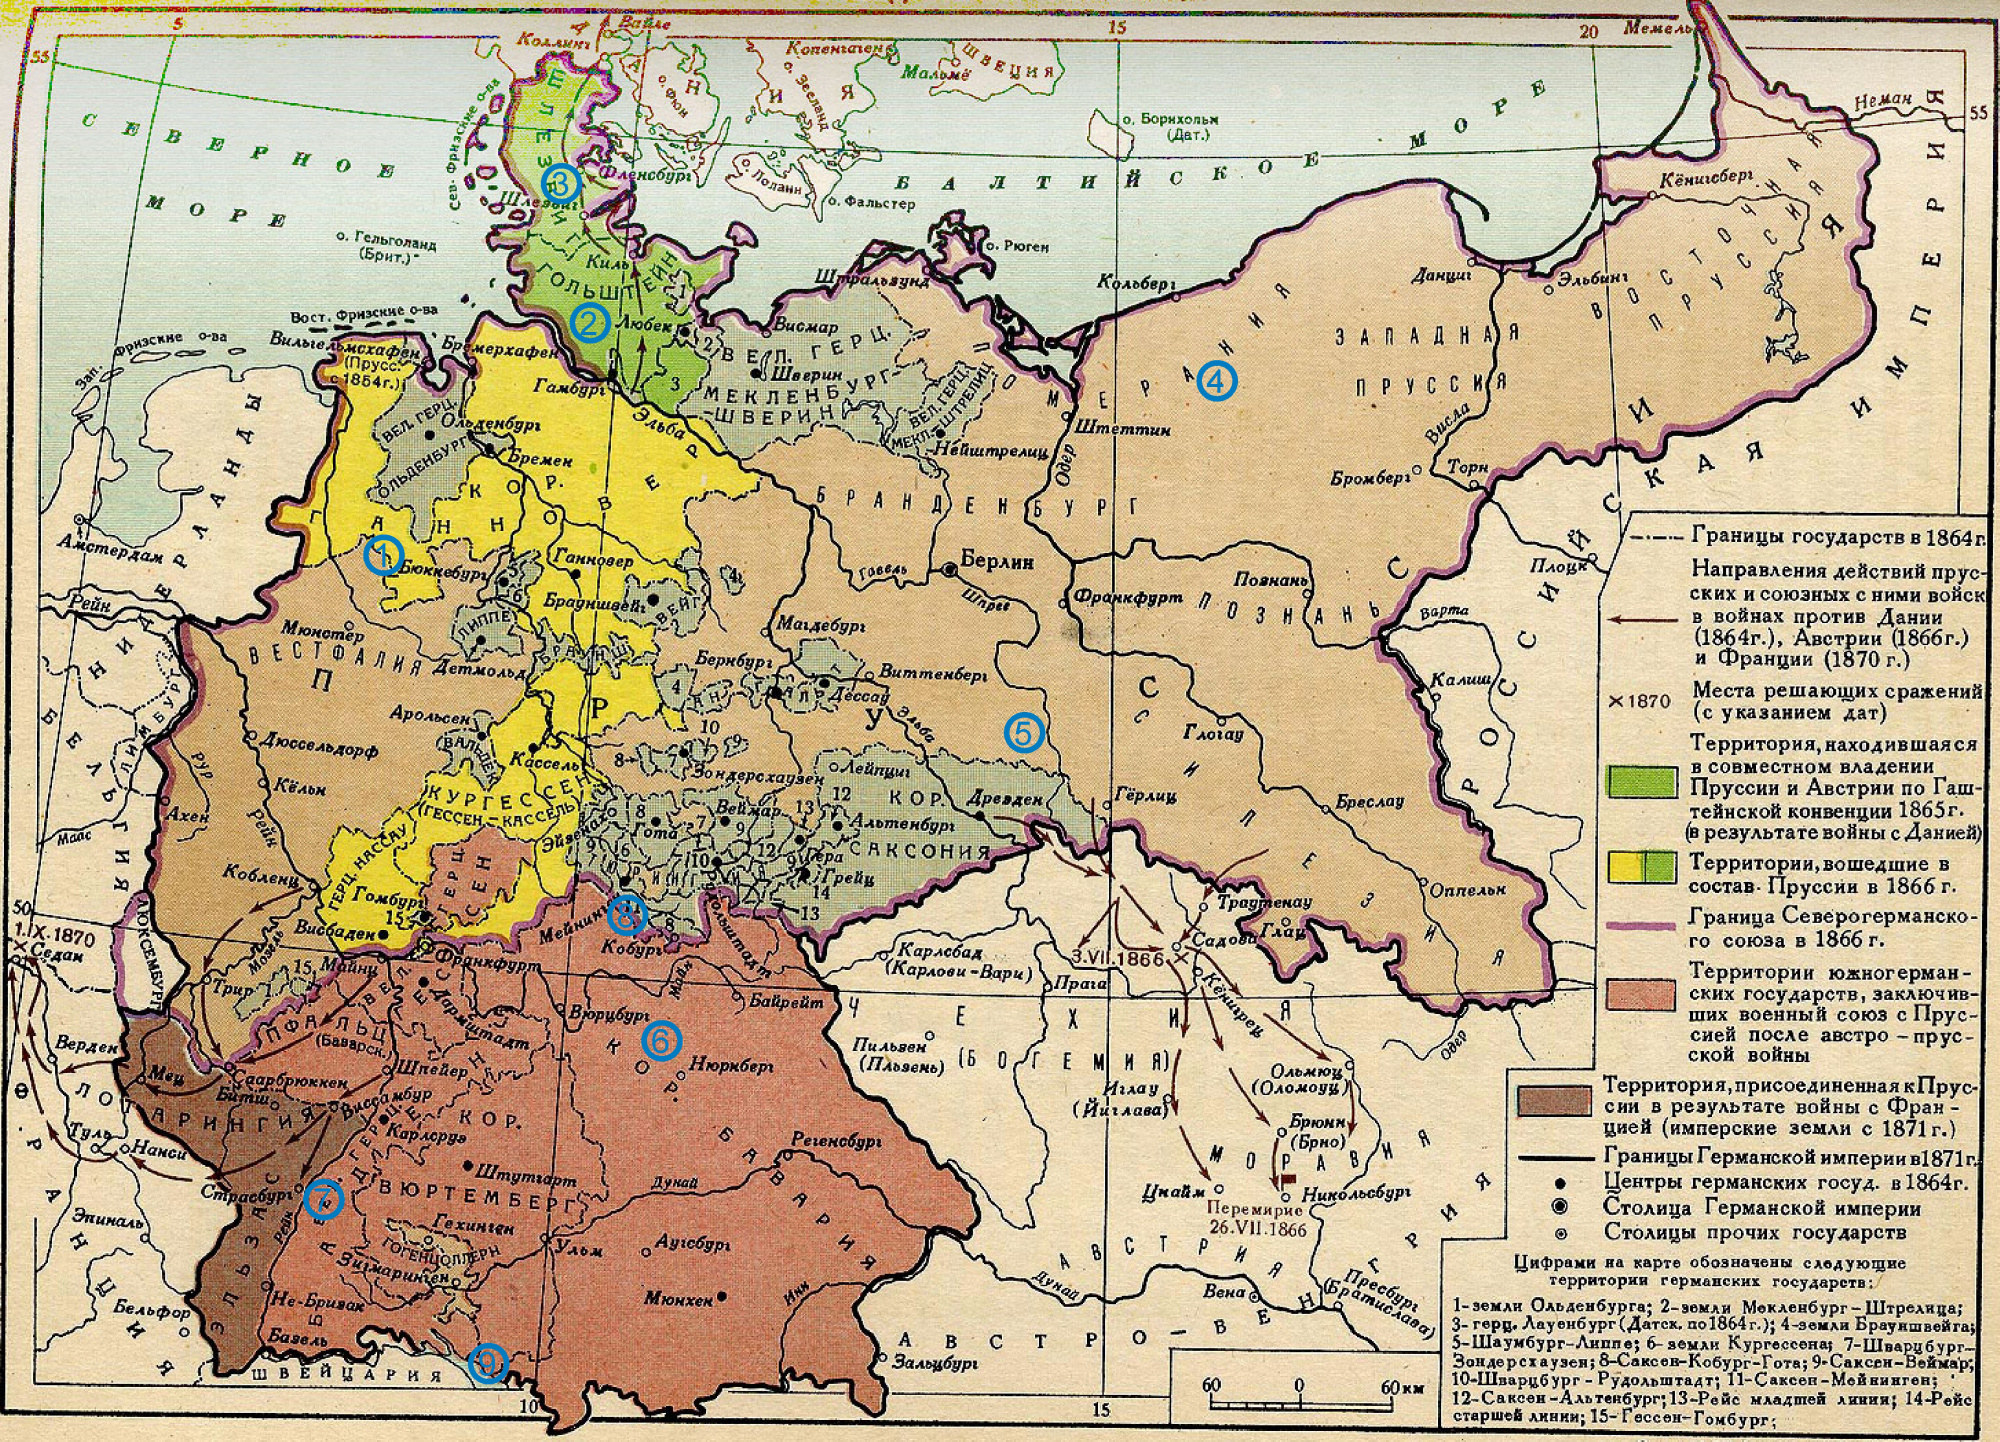 Пруссия где находиться 182